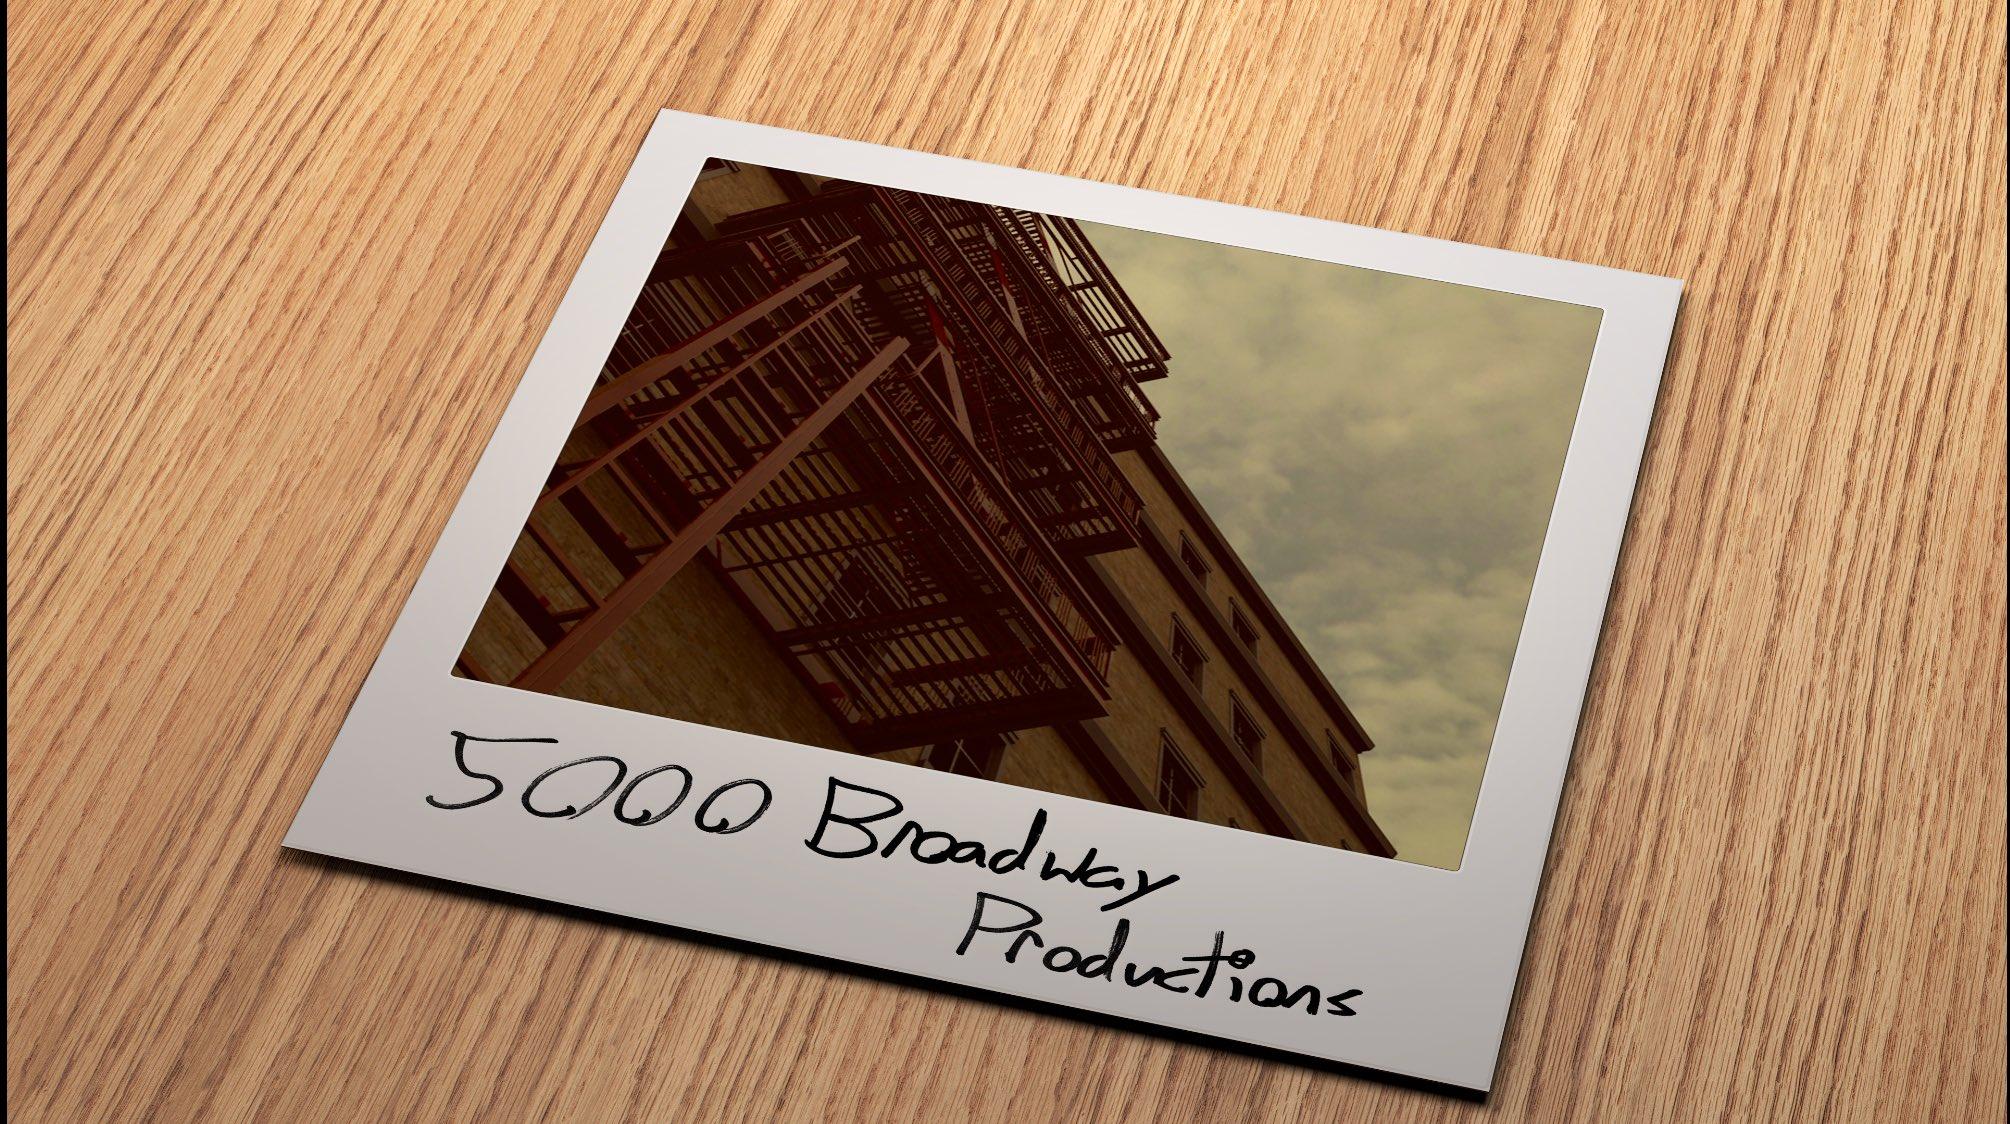 5000bwayproductions.jpg